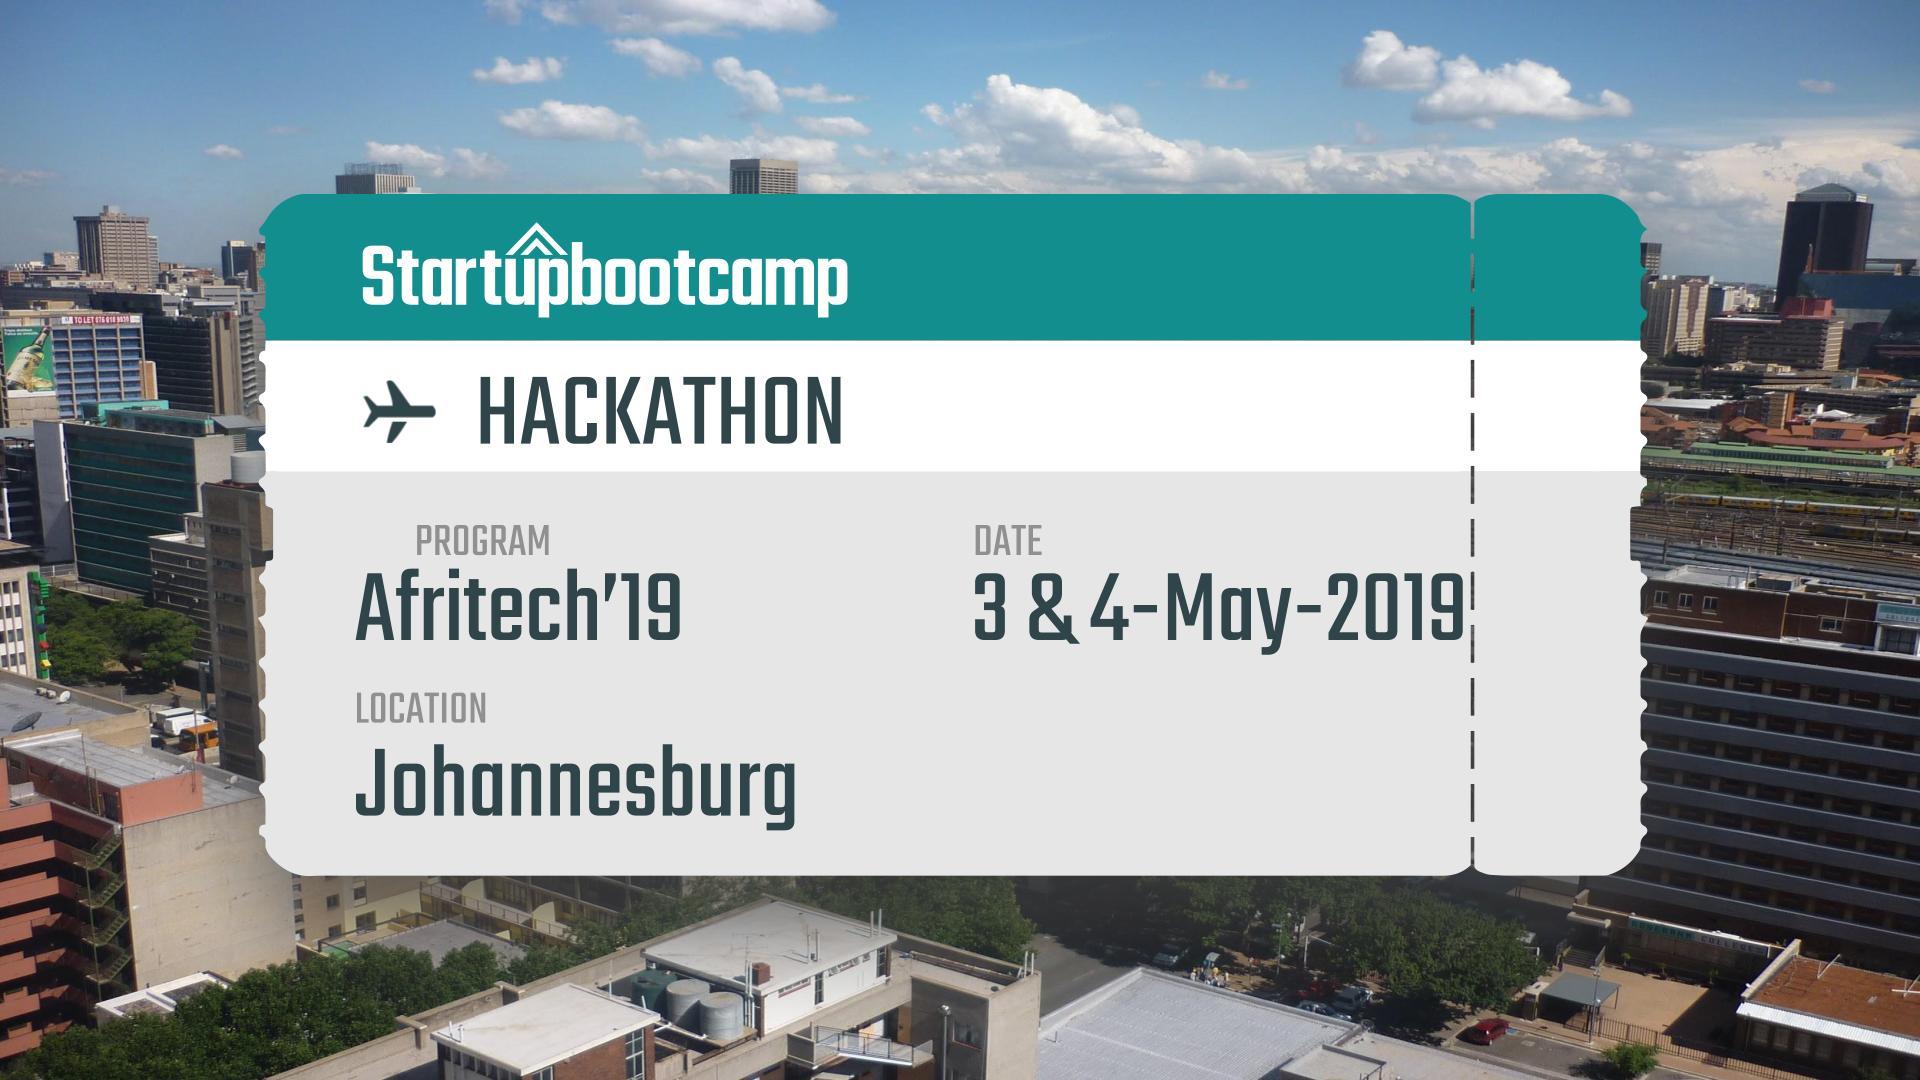 Johannesburg Hackathon - May 4